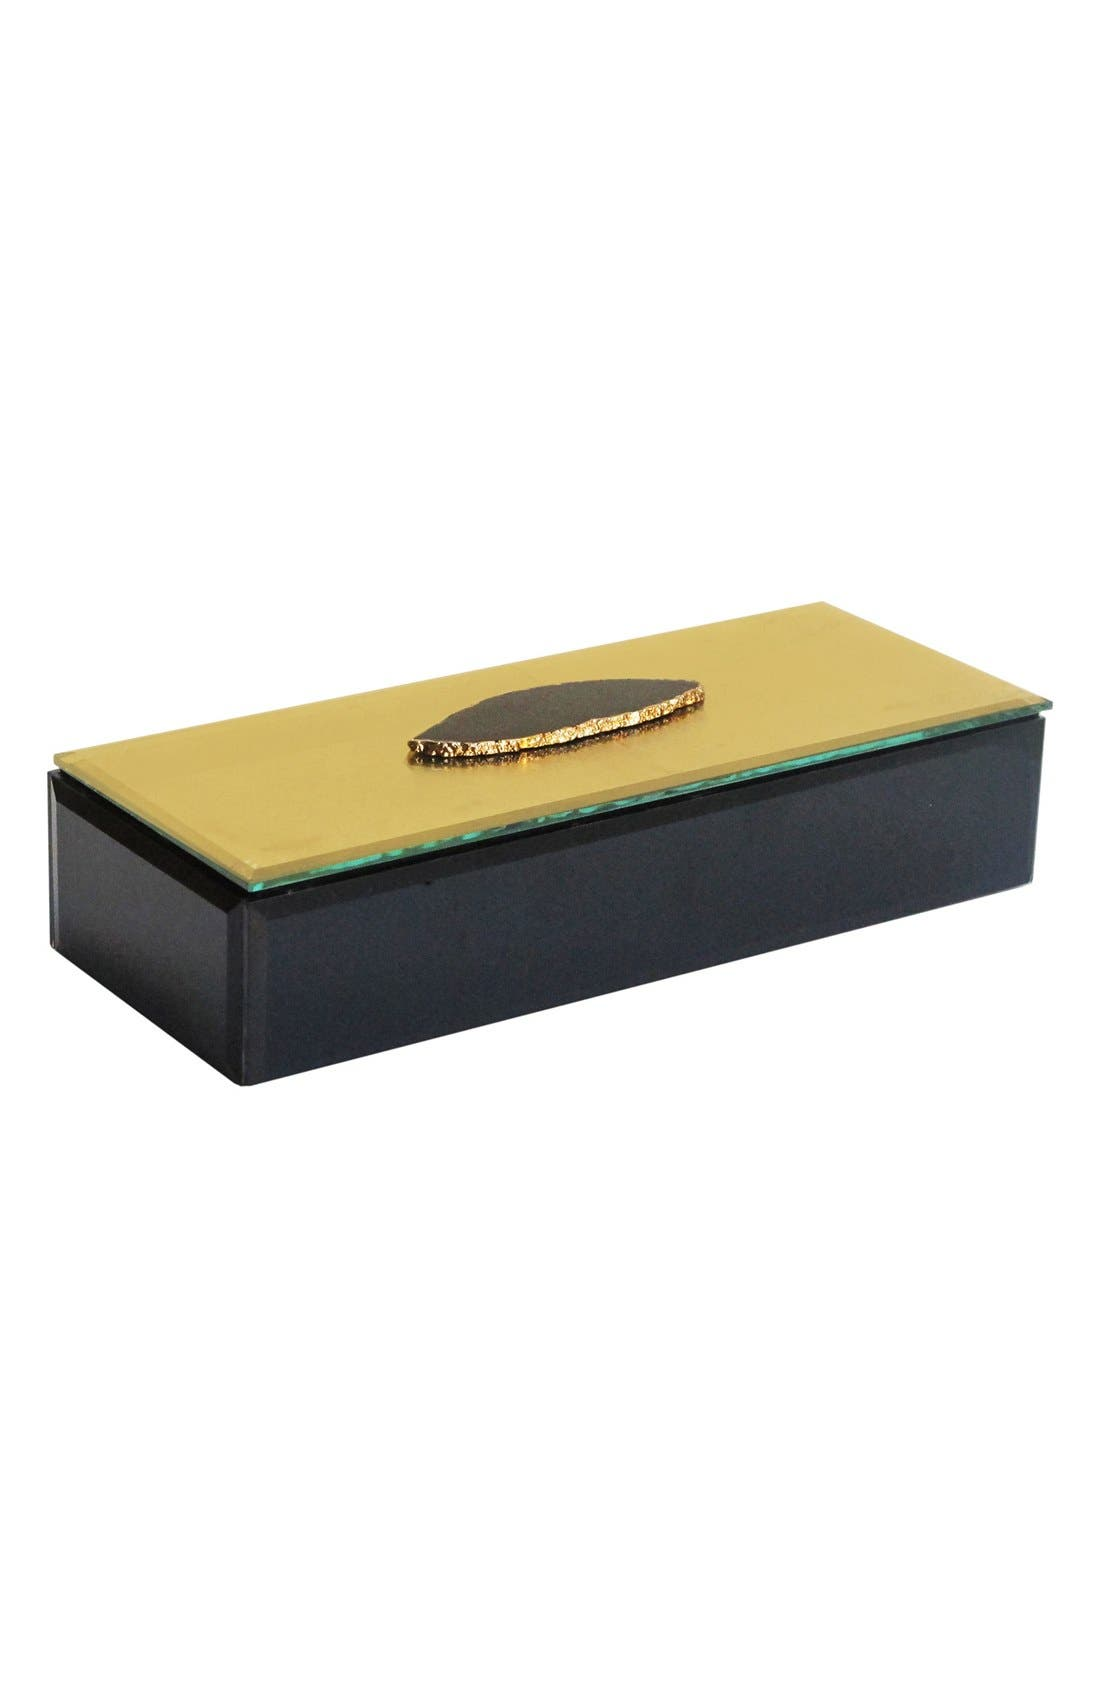 Main Image - American Atelier Agate Box